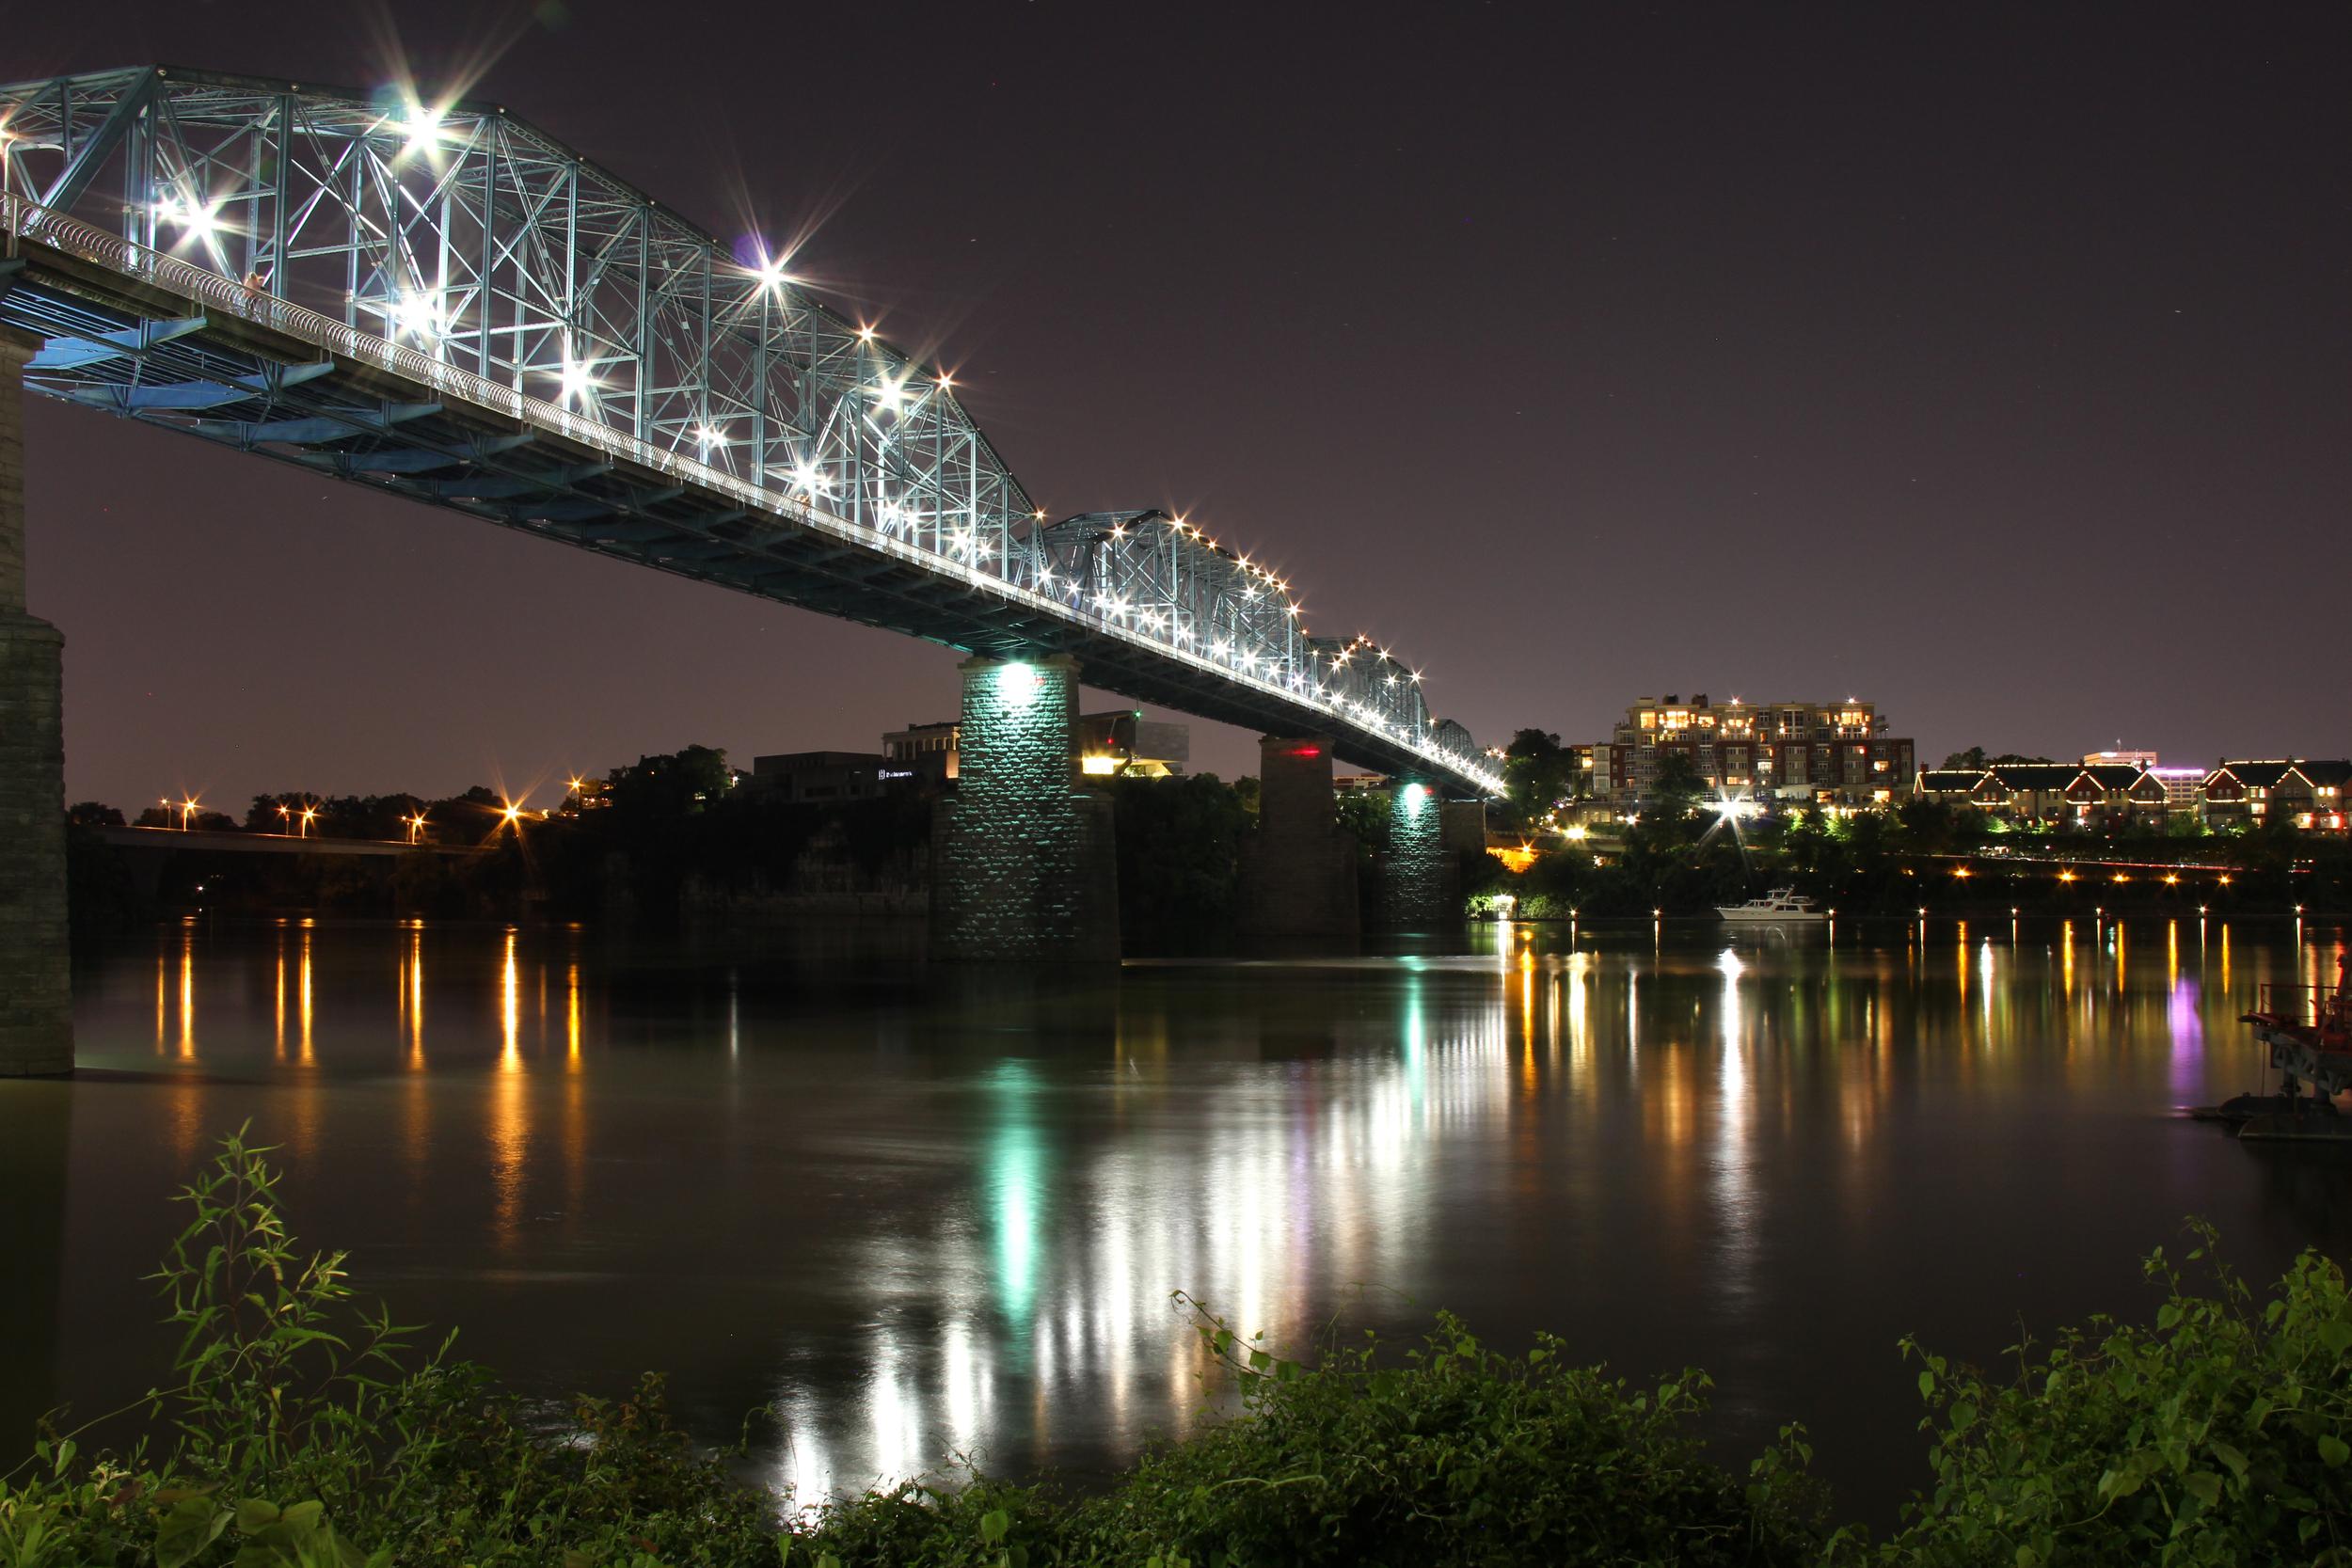 Walnut Street Bridge. Chattanooga, Tenn. 2013